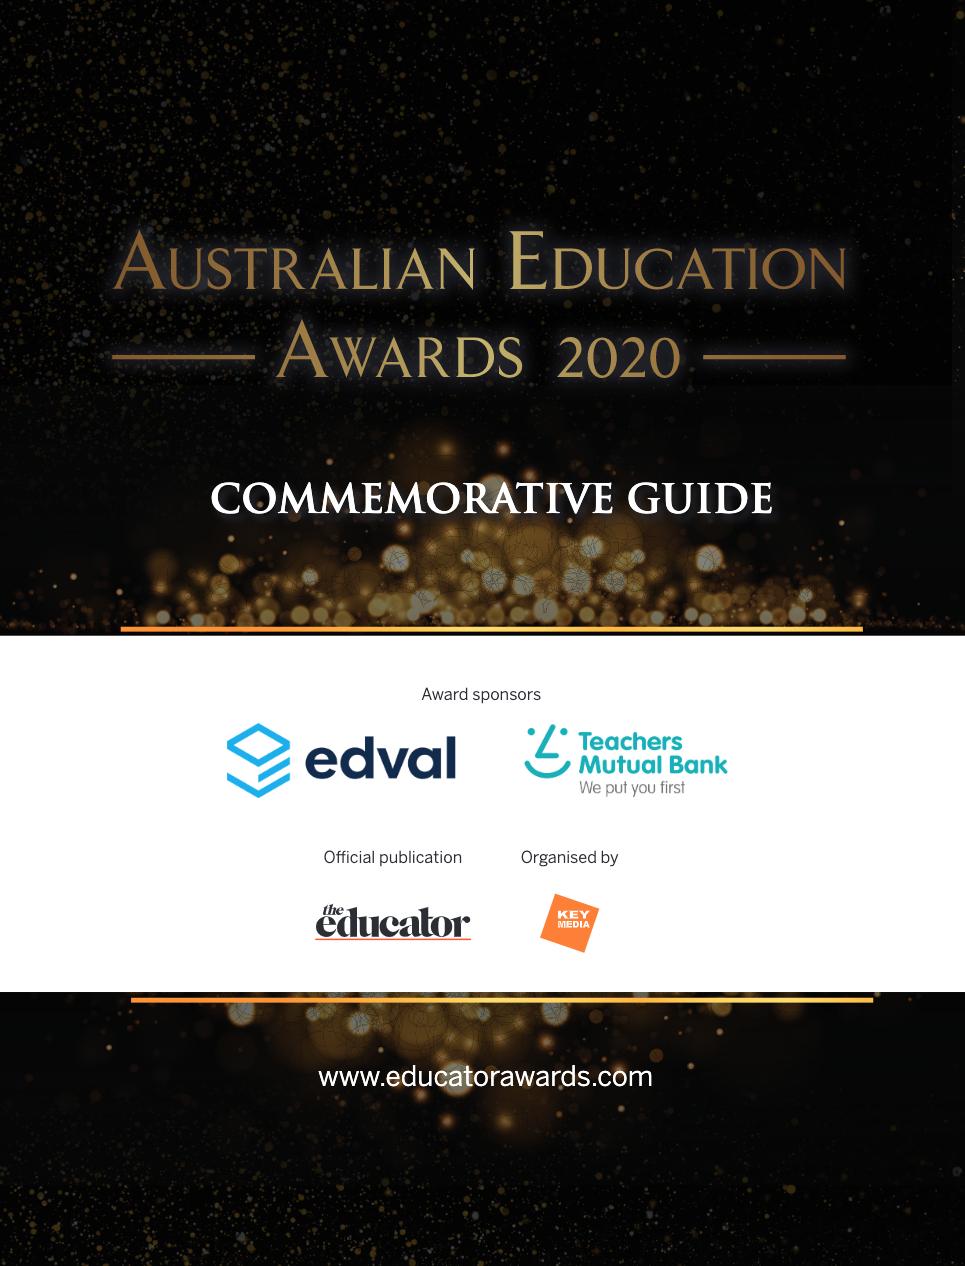 Australian Education Awards 2020 Commemorative Guide